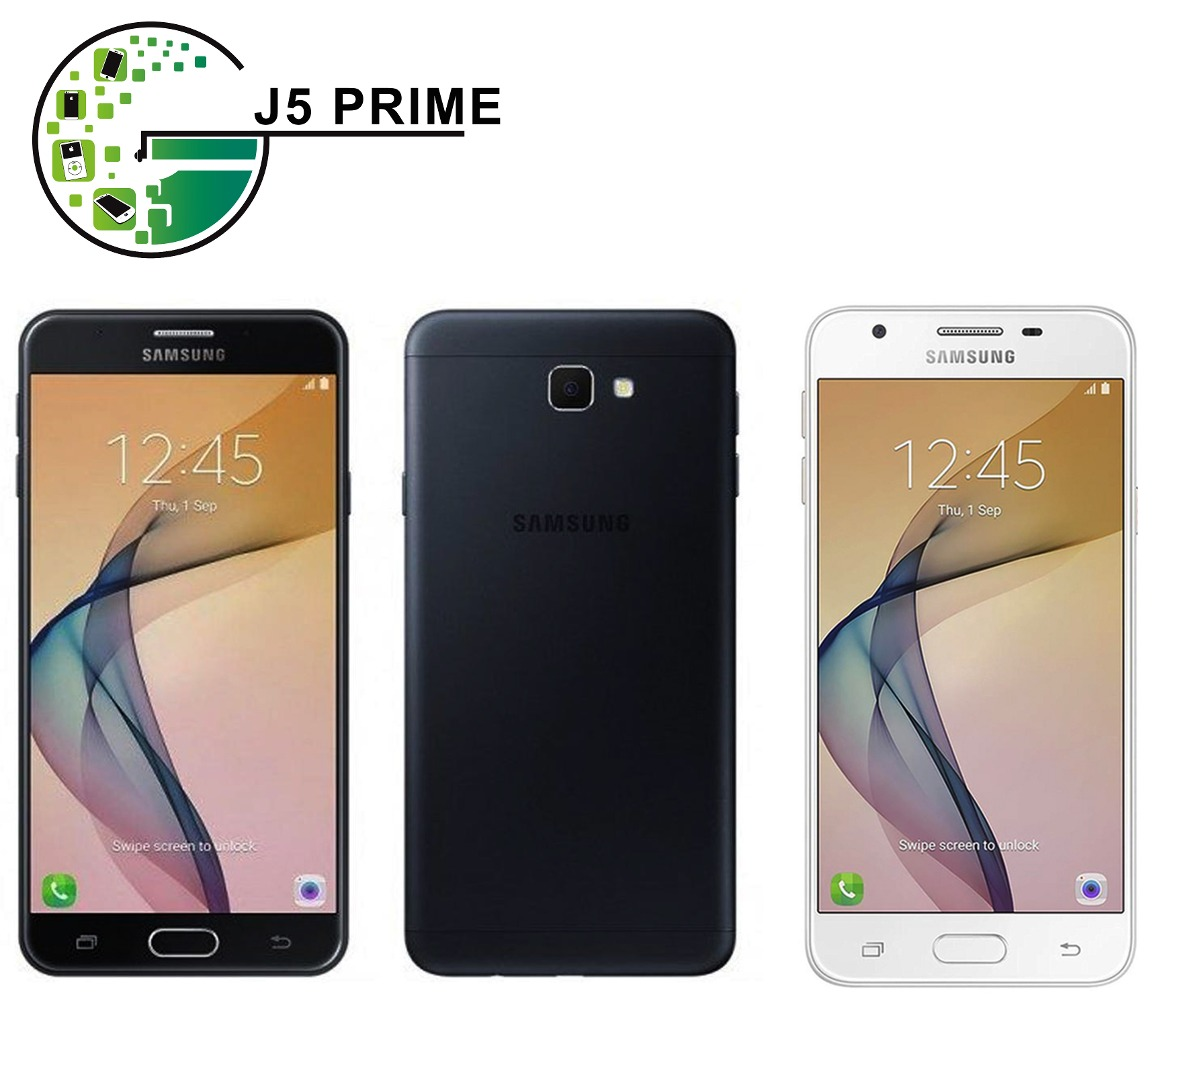 Harga Dan Spesifikasi Samsung Galaxy J5 Pro 230 J7 Prime 16gb 238 Us